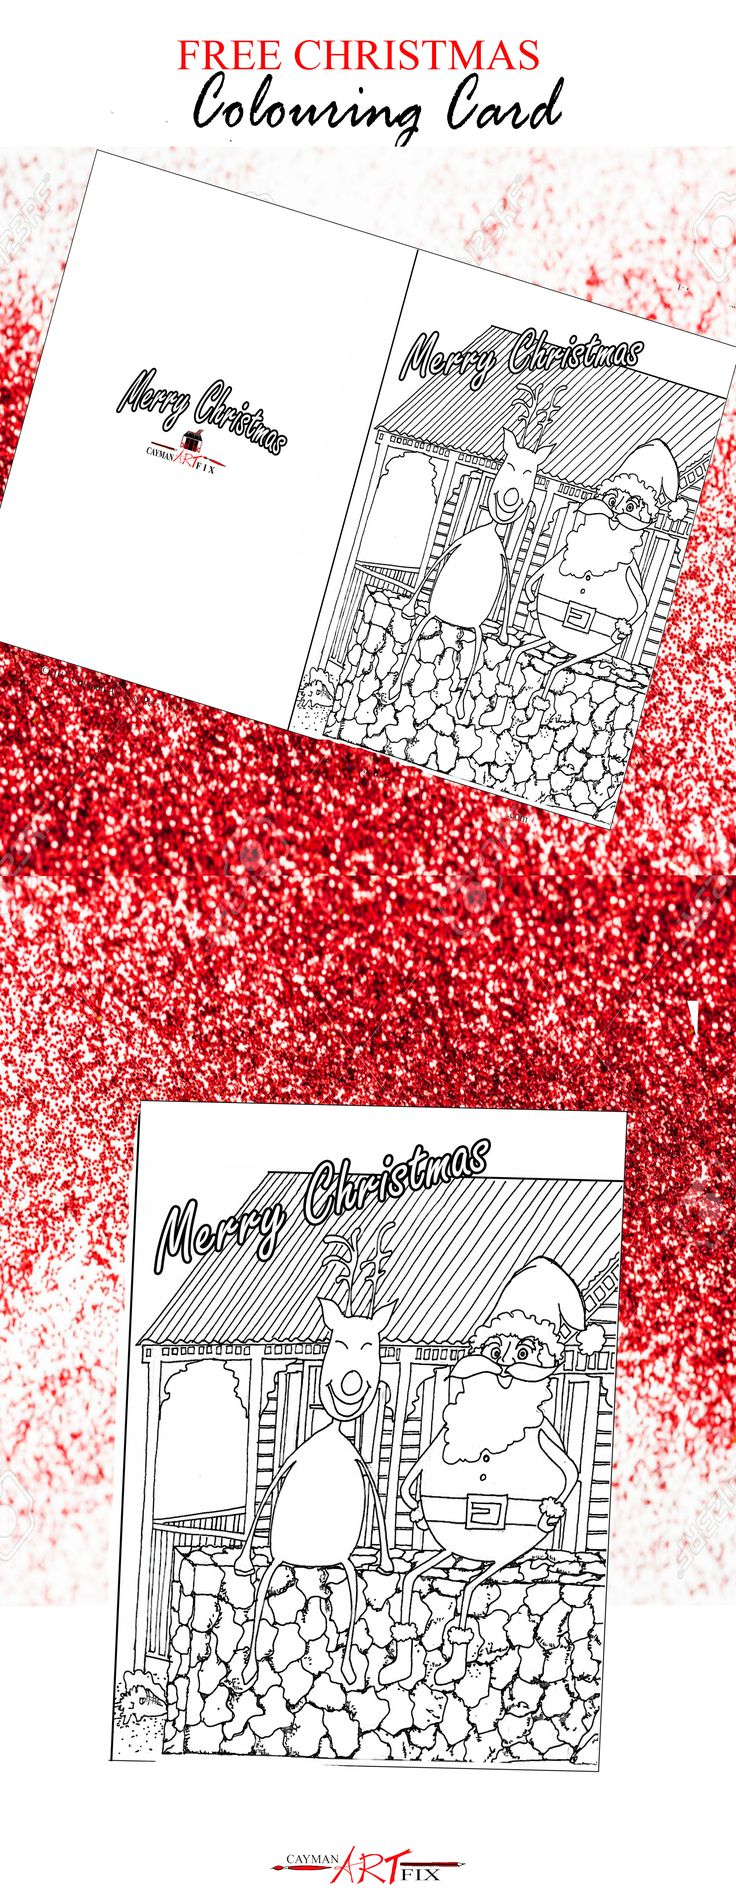 A DIY Christmas Card just for you! Print it off and Colour or just Print and Share! #DIY #ChristmasCard #islandart #getyours #printables #color #CaymanIslands #Christmas #Caymanartfix